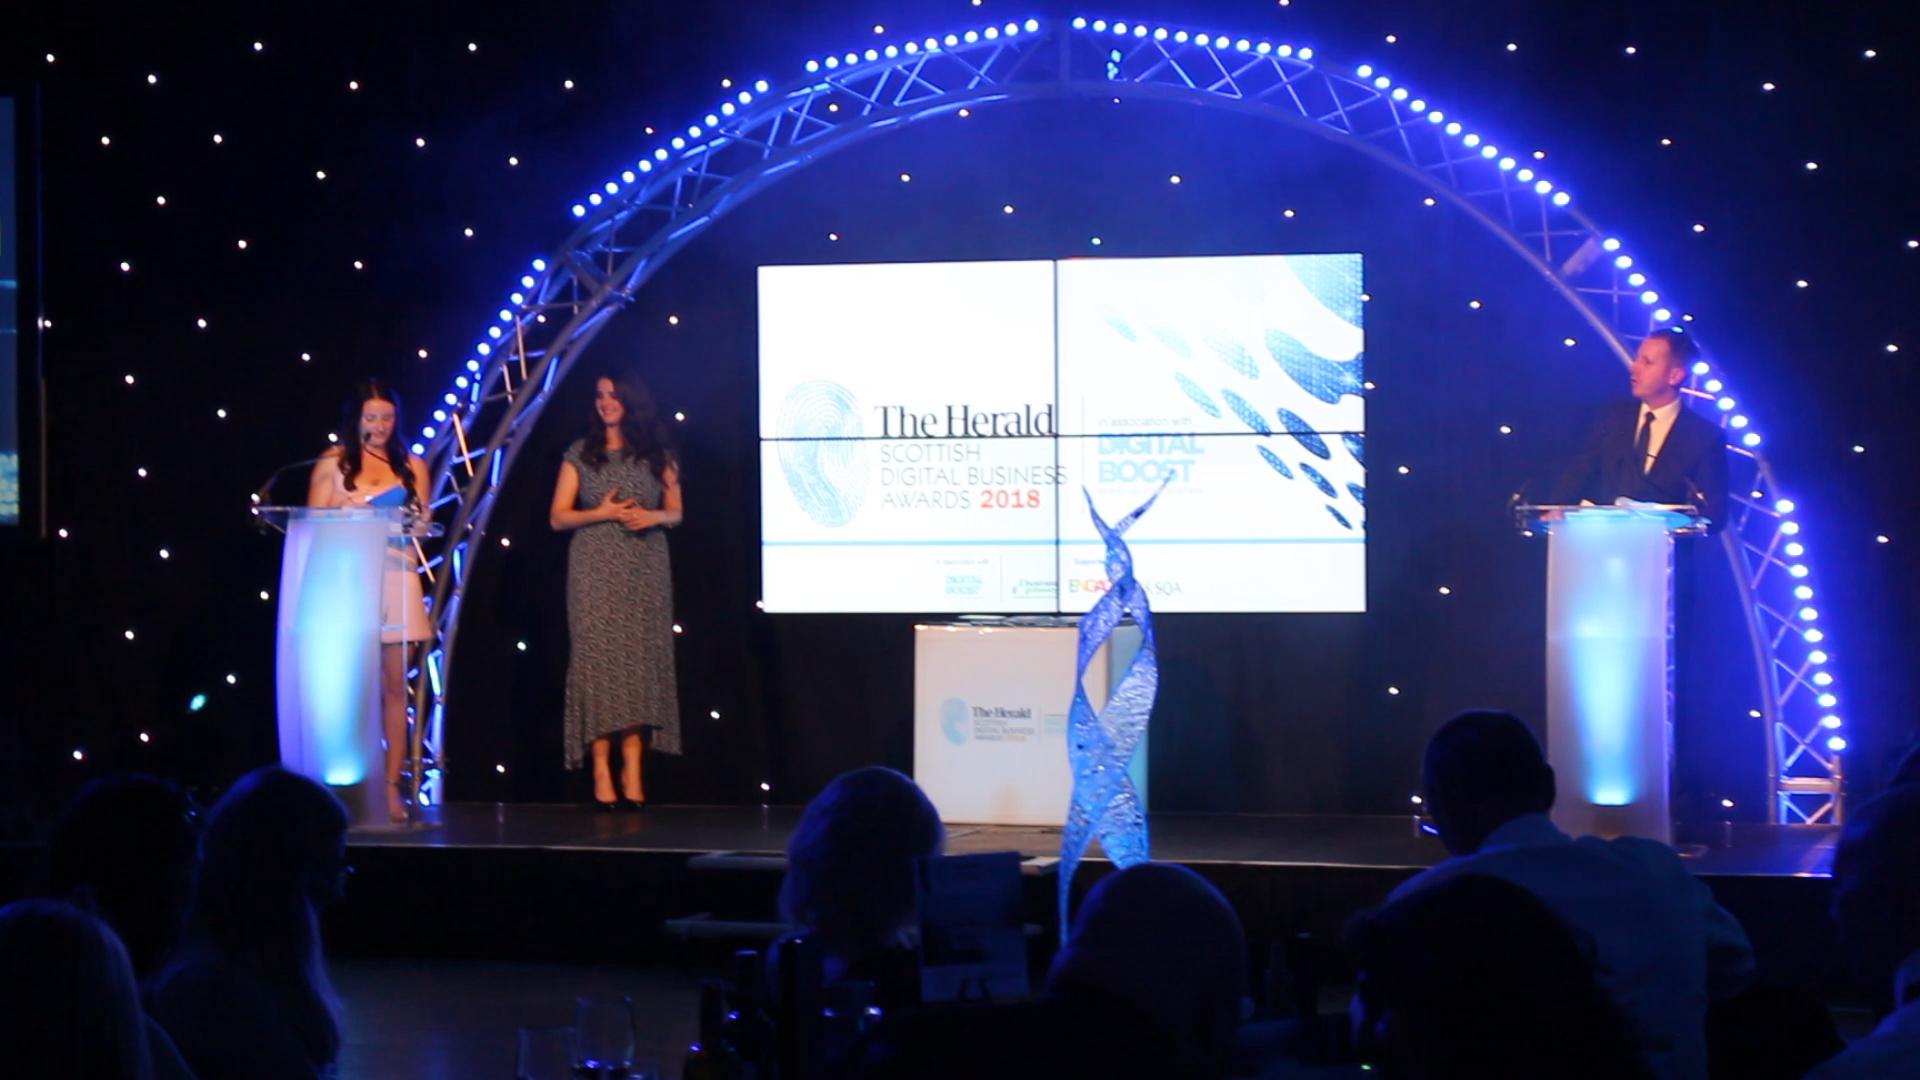 Herald Scottish Digital Business Awards 2018